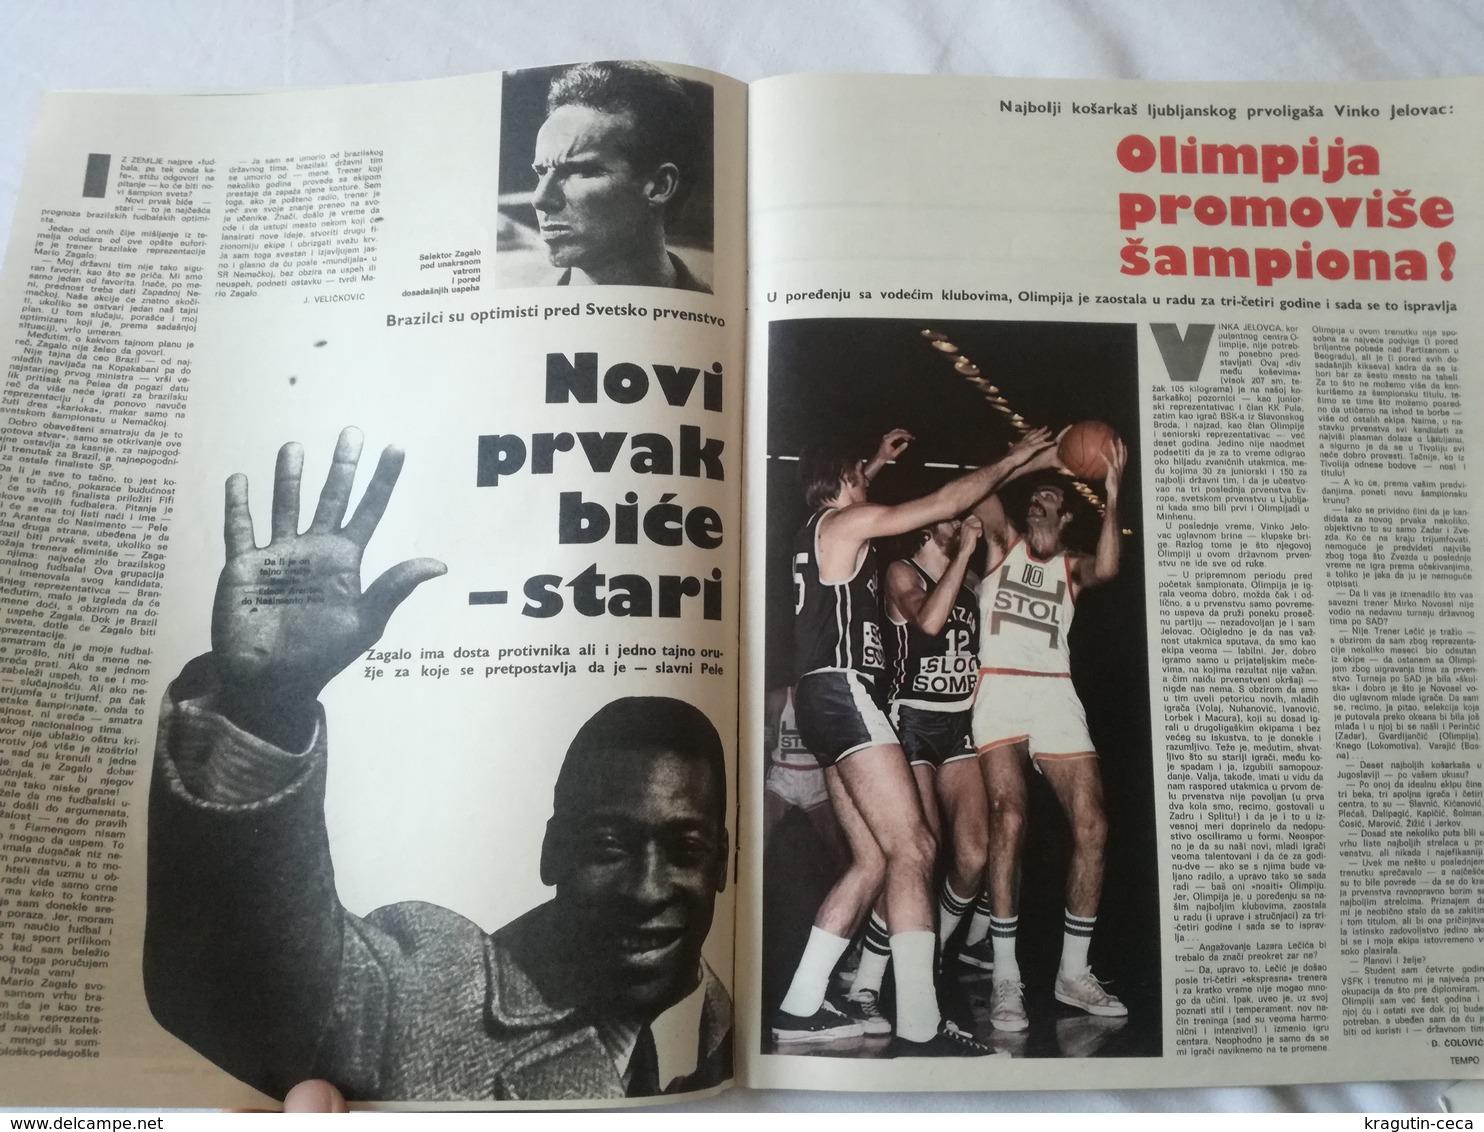 1974 TEMPO YUGOSLAVIA SERBIA SPORT FOOTBALL MAGAZINE NEWSPAPERS WM74 CHAMPIONSHIPS WOMAN HANDBALL PELE HAJDUK BASKETBALL - Deportes